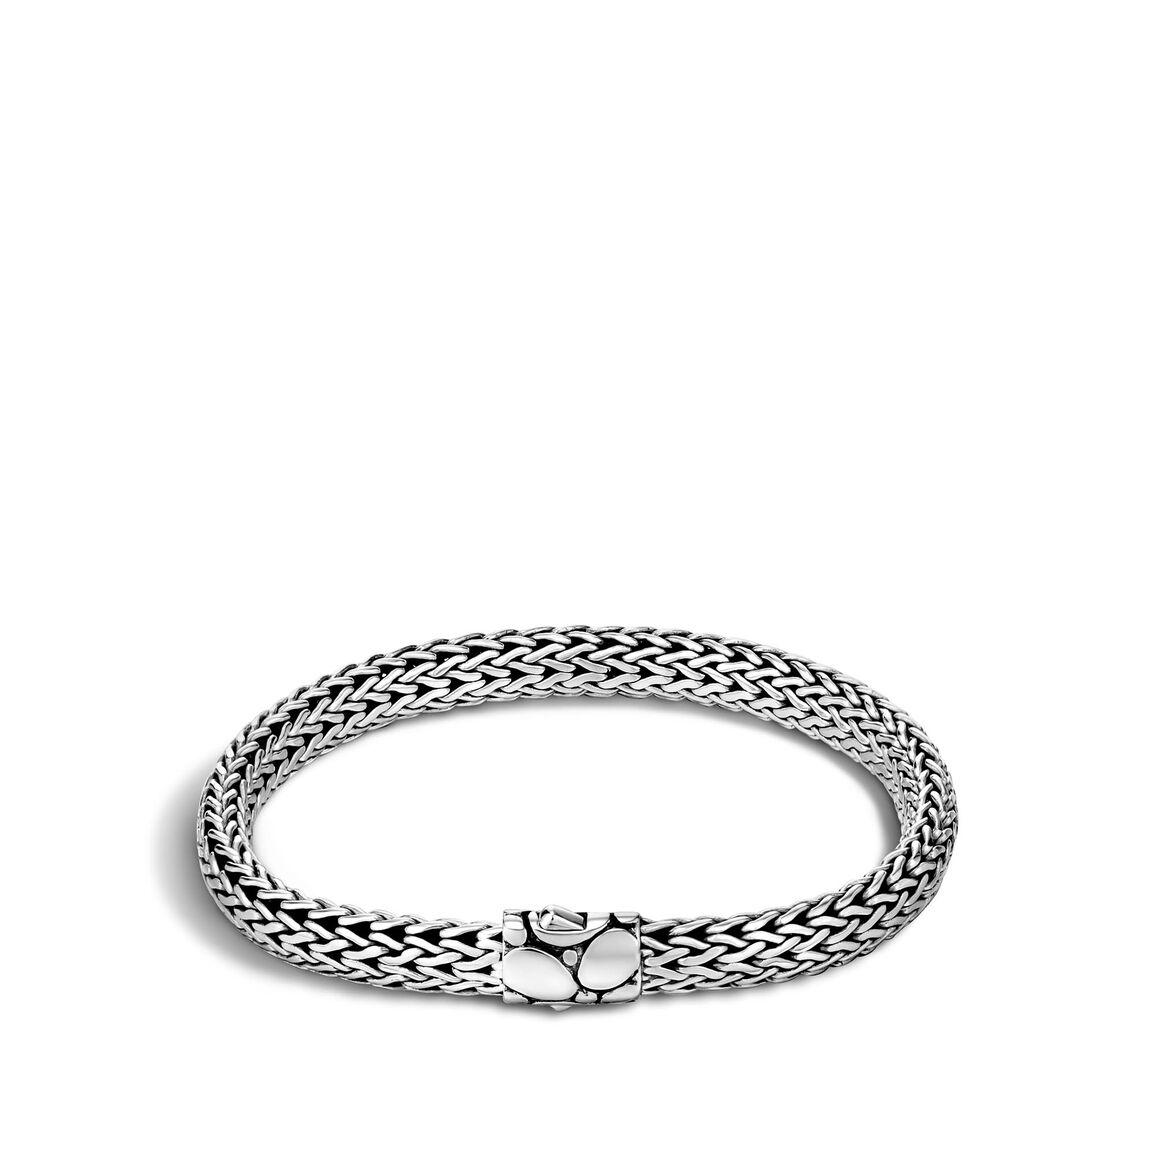 Kali Small Bracelet